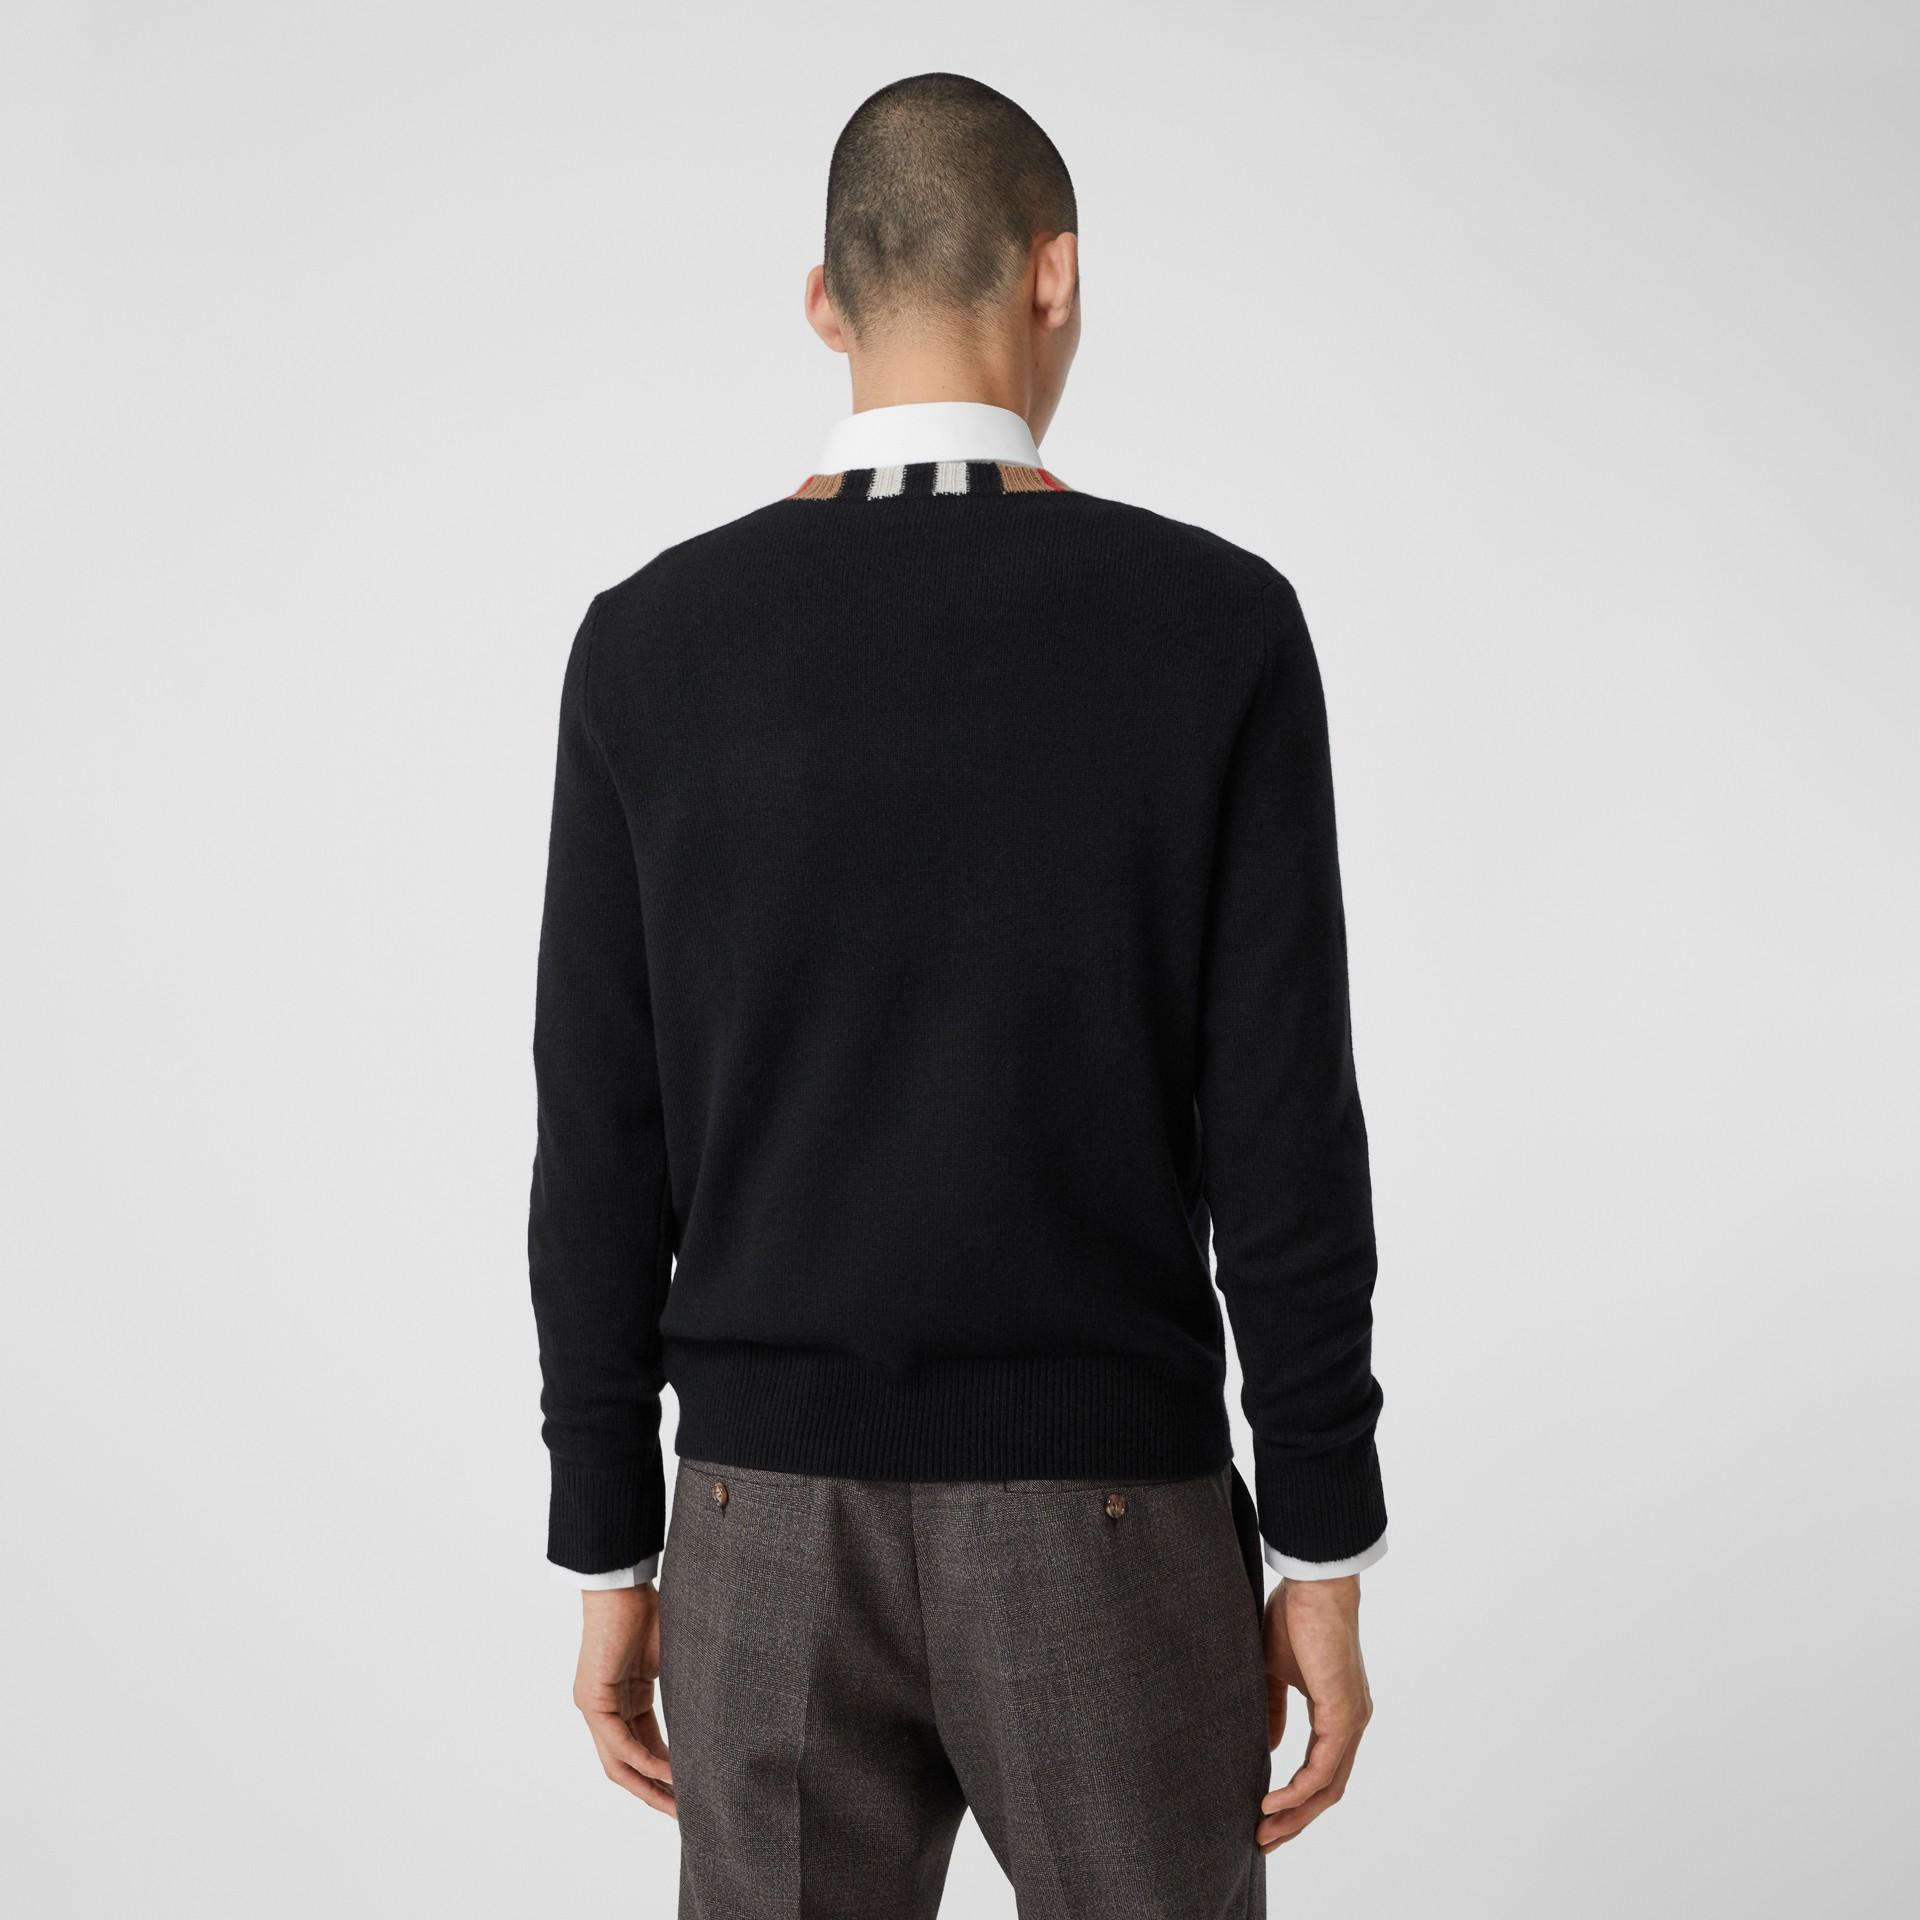 Icon Stripe Trim Cashmere Sweater in Black - Men | Burberry - gallery image 2